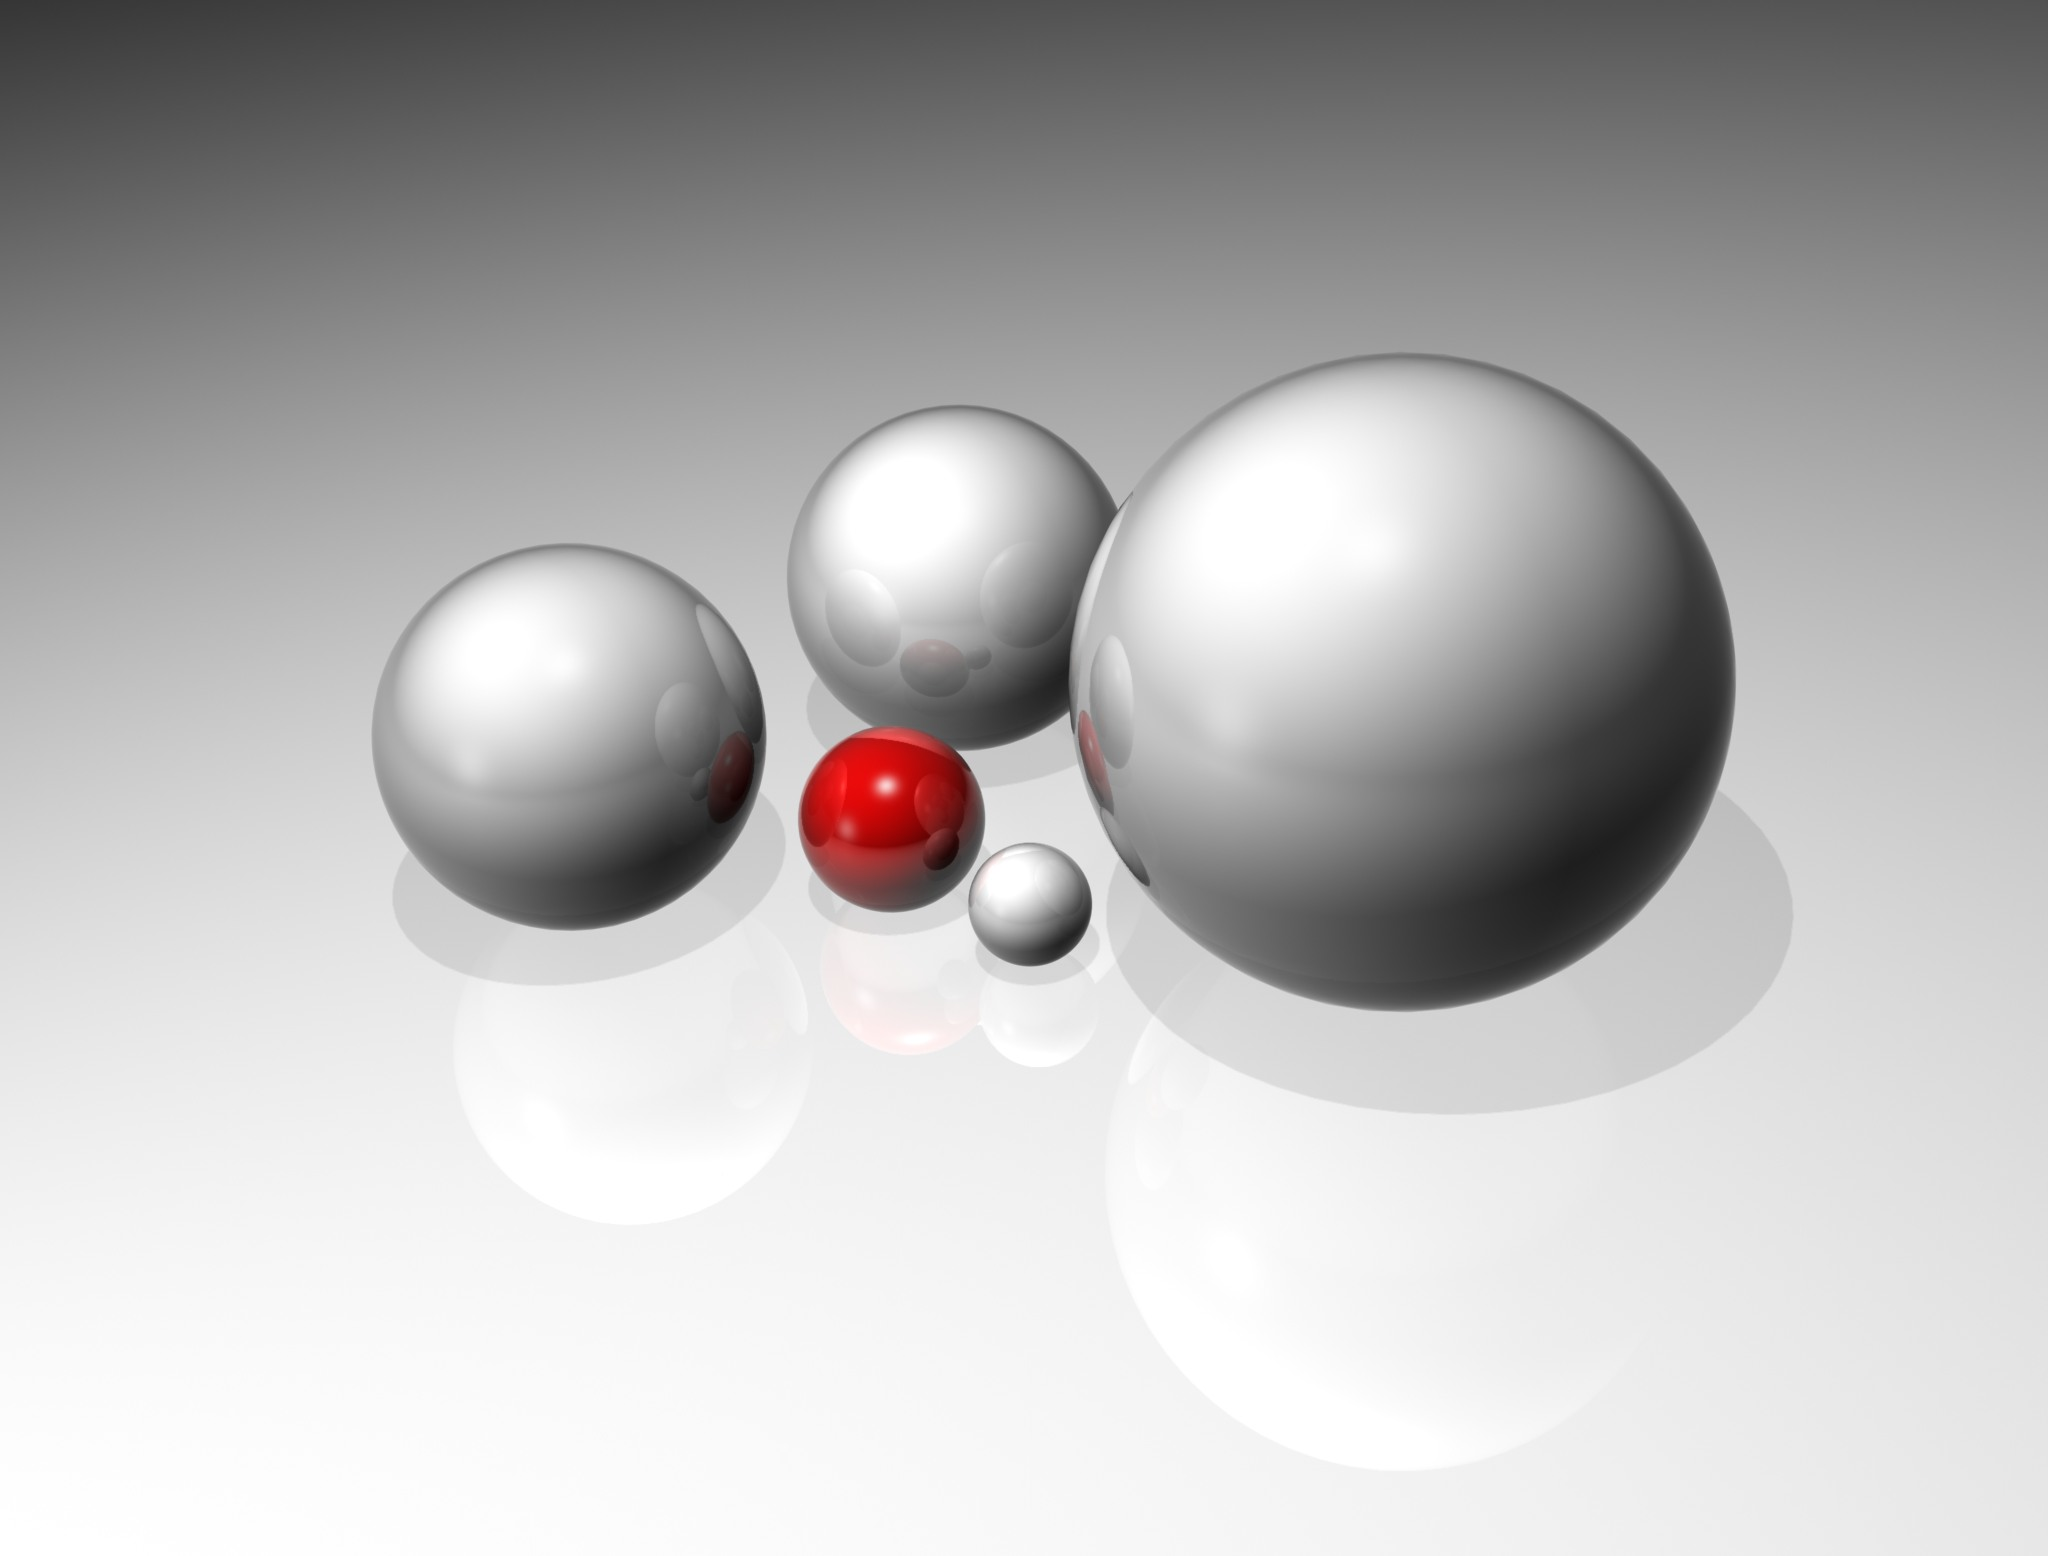 Reflecting Spheres, 3d, Balls, Clean, Model, HQ Photo